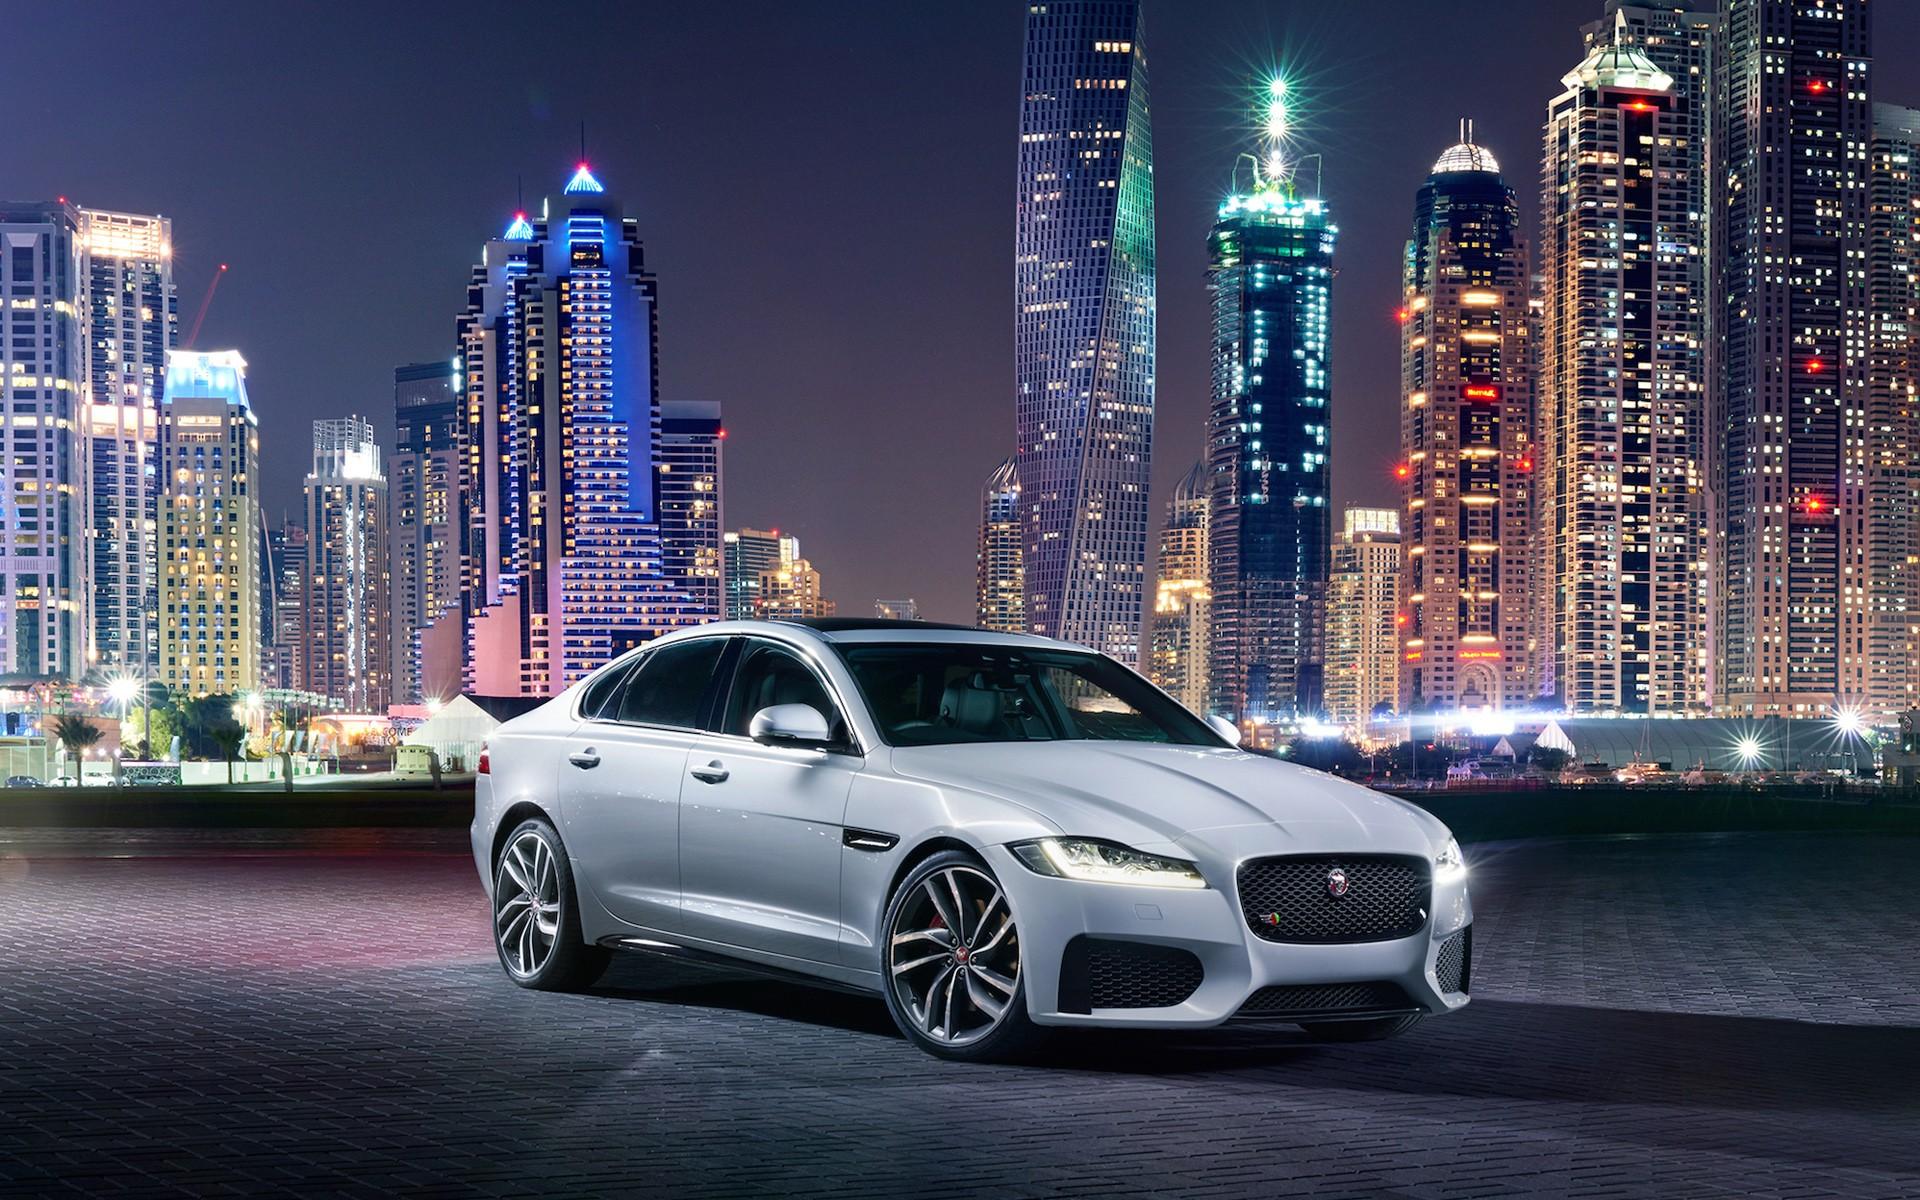 Jaguar XF, HD Cars, 4k Wallpapers, Images, Backgrounds ...